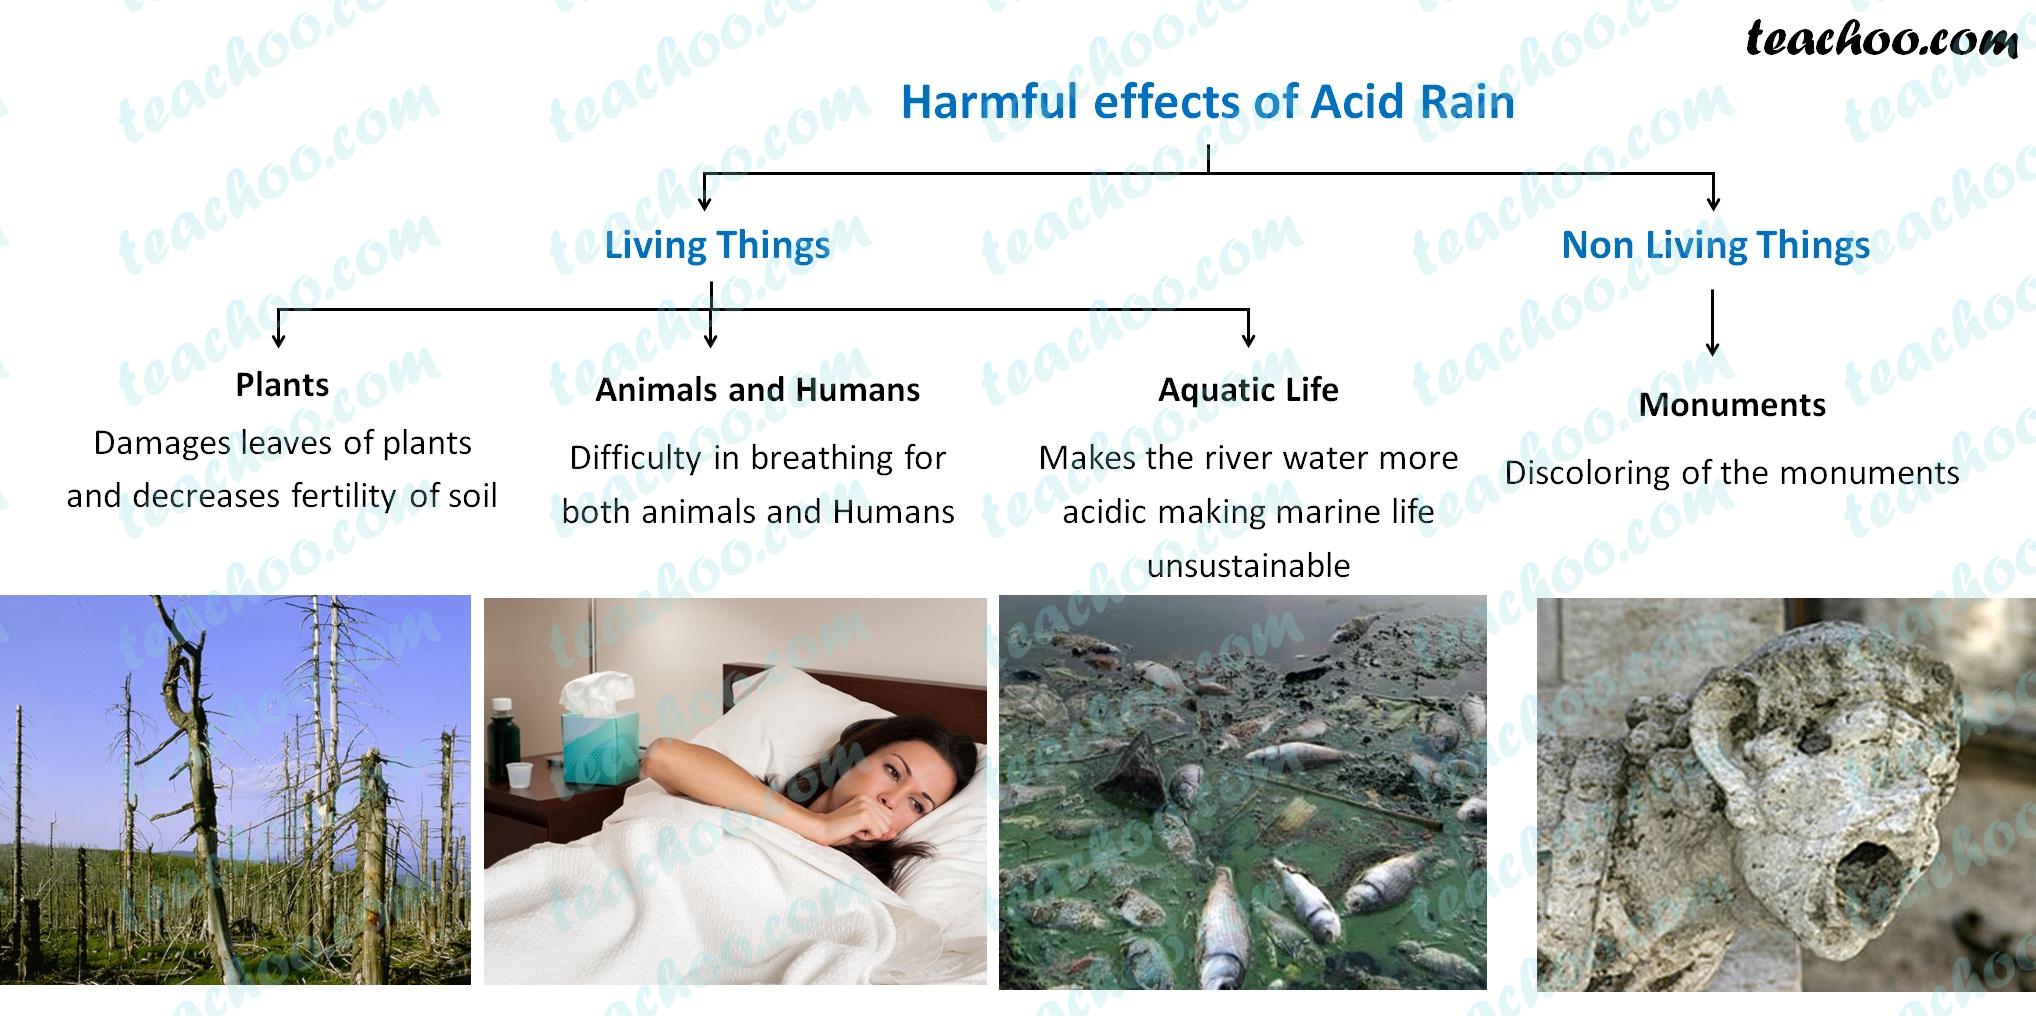 harmful-effects-of-acid-rain---teachoo.jpg